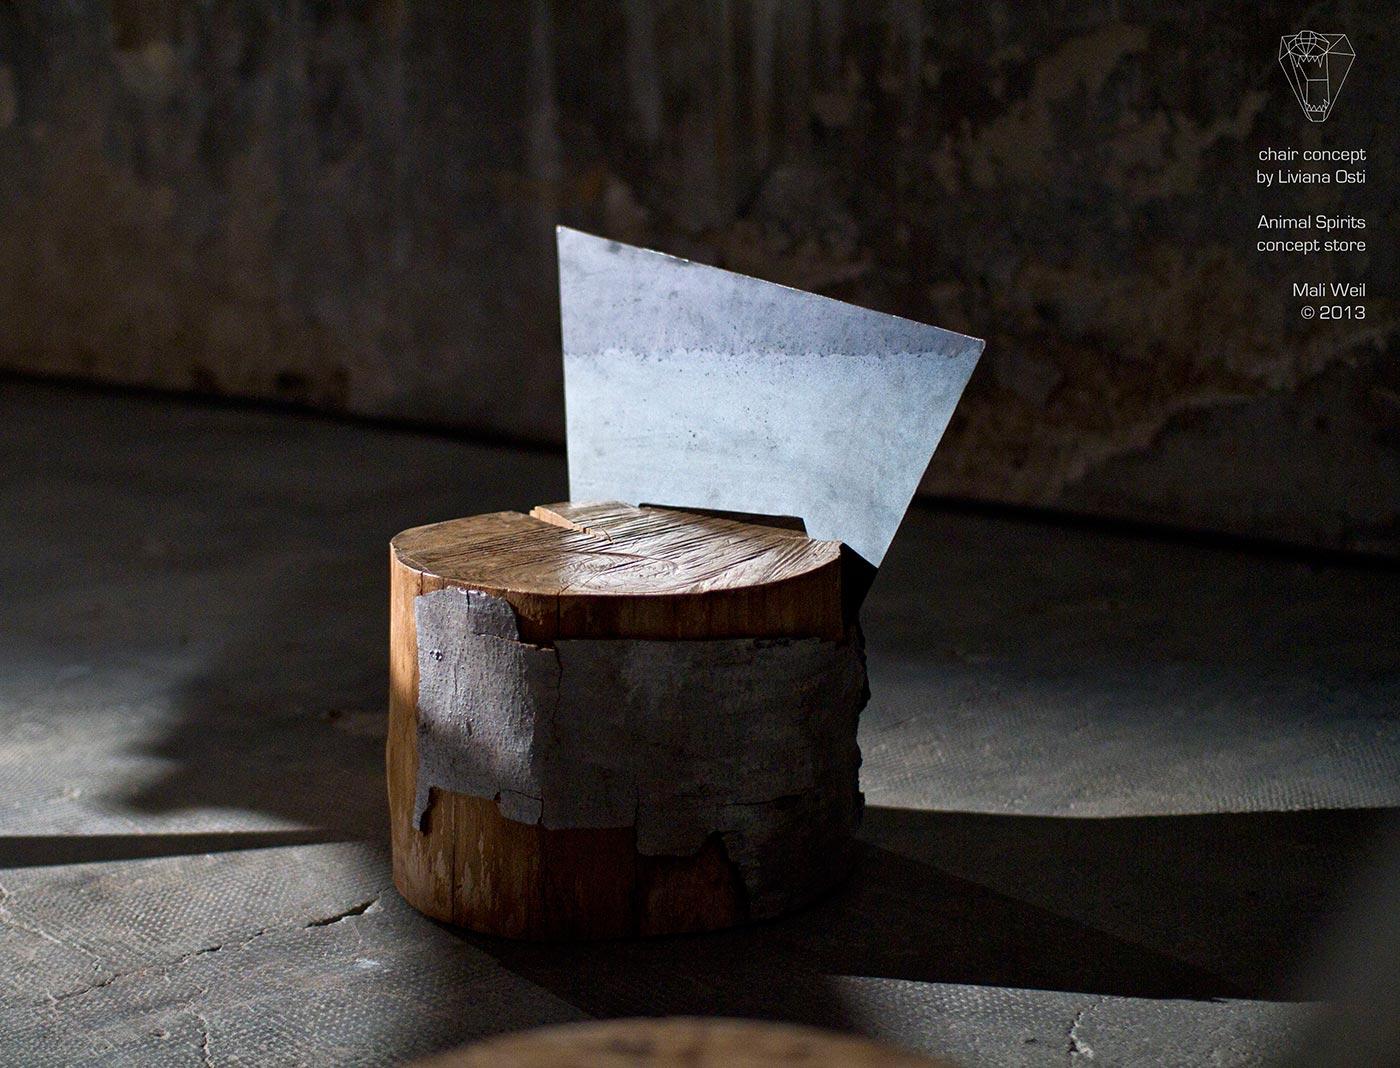 Mali-Weil-Animal Spirits Chair concept Design Liviana Osti